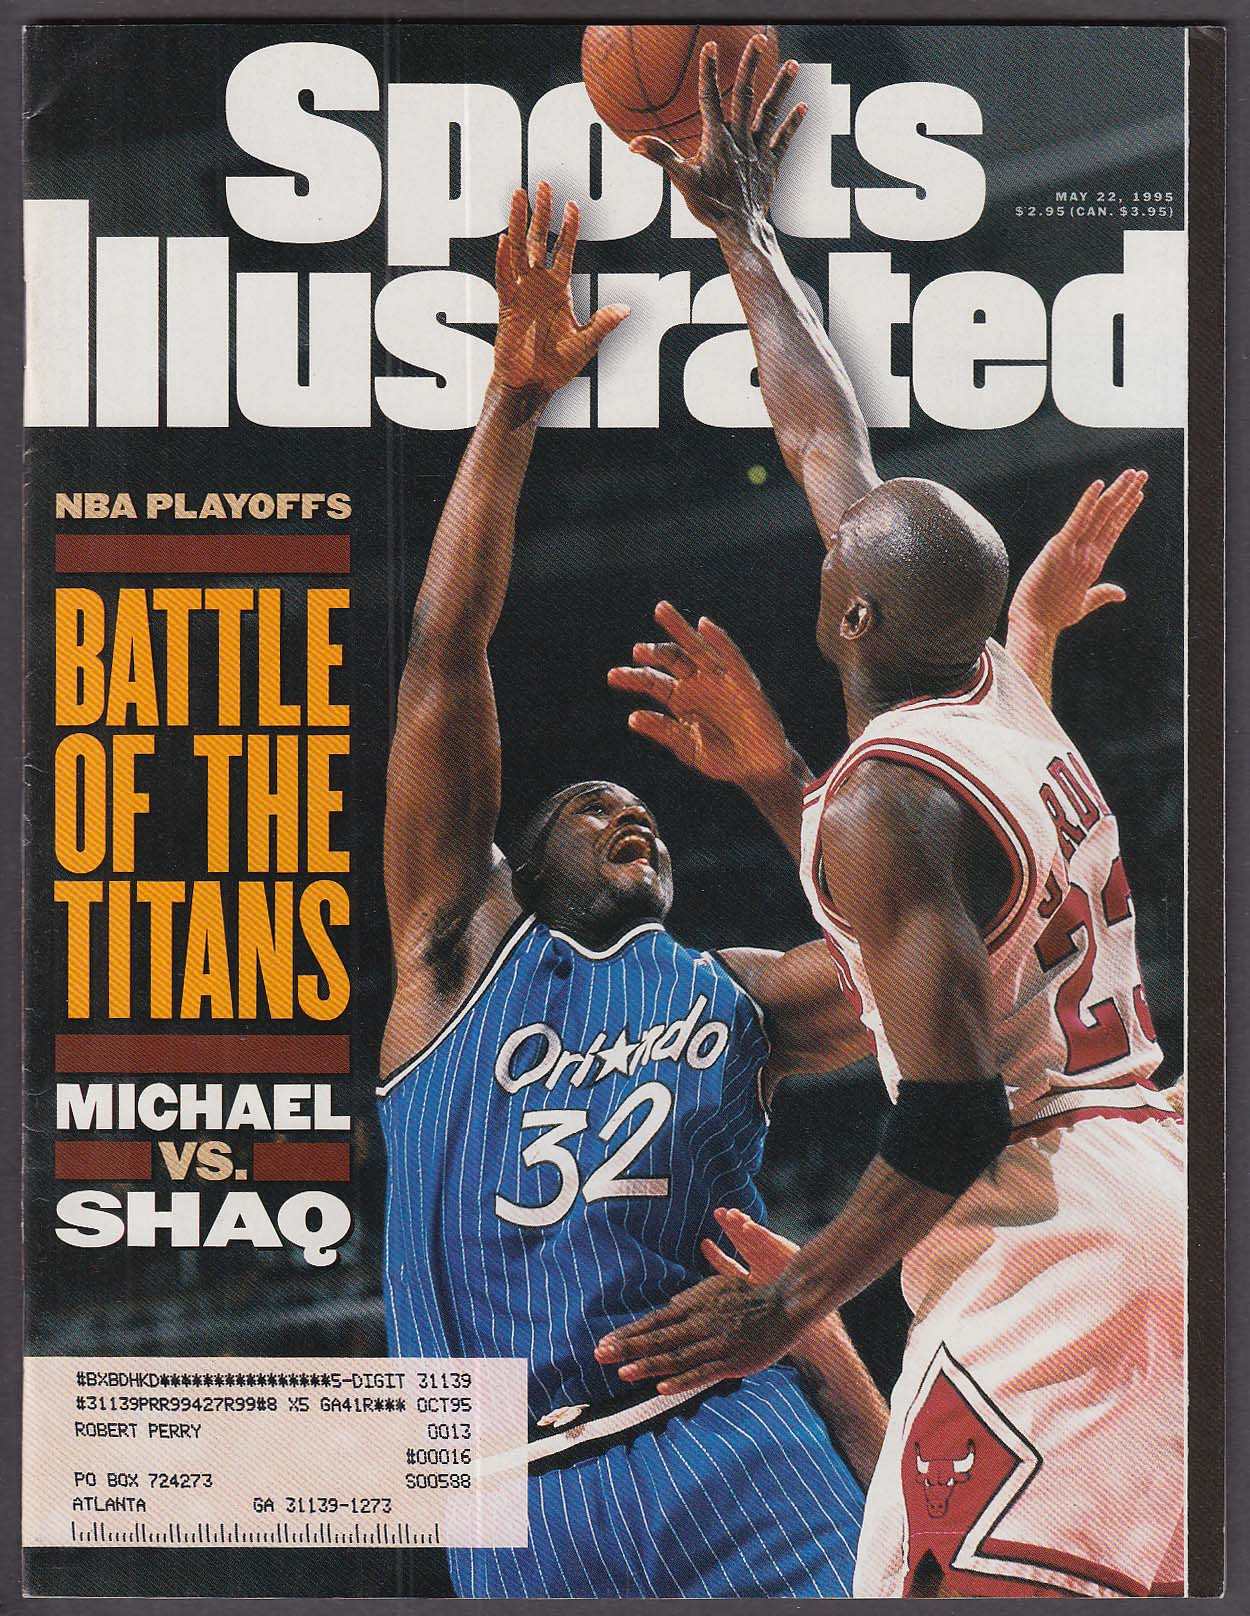 SPORTS ILLUSTRATED Michael Jordan Shaq Shaquille O'Neal Dennis Rodman 5/22 1995